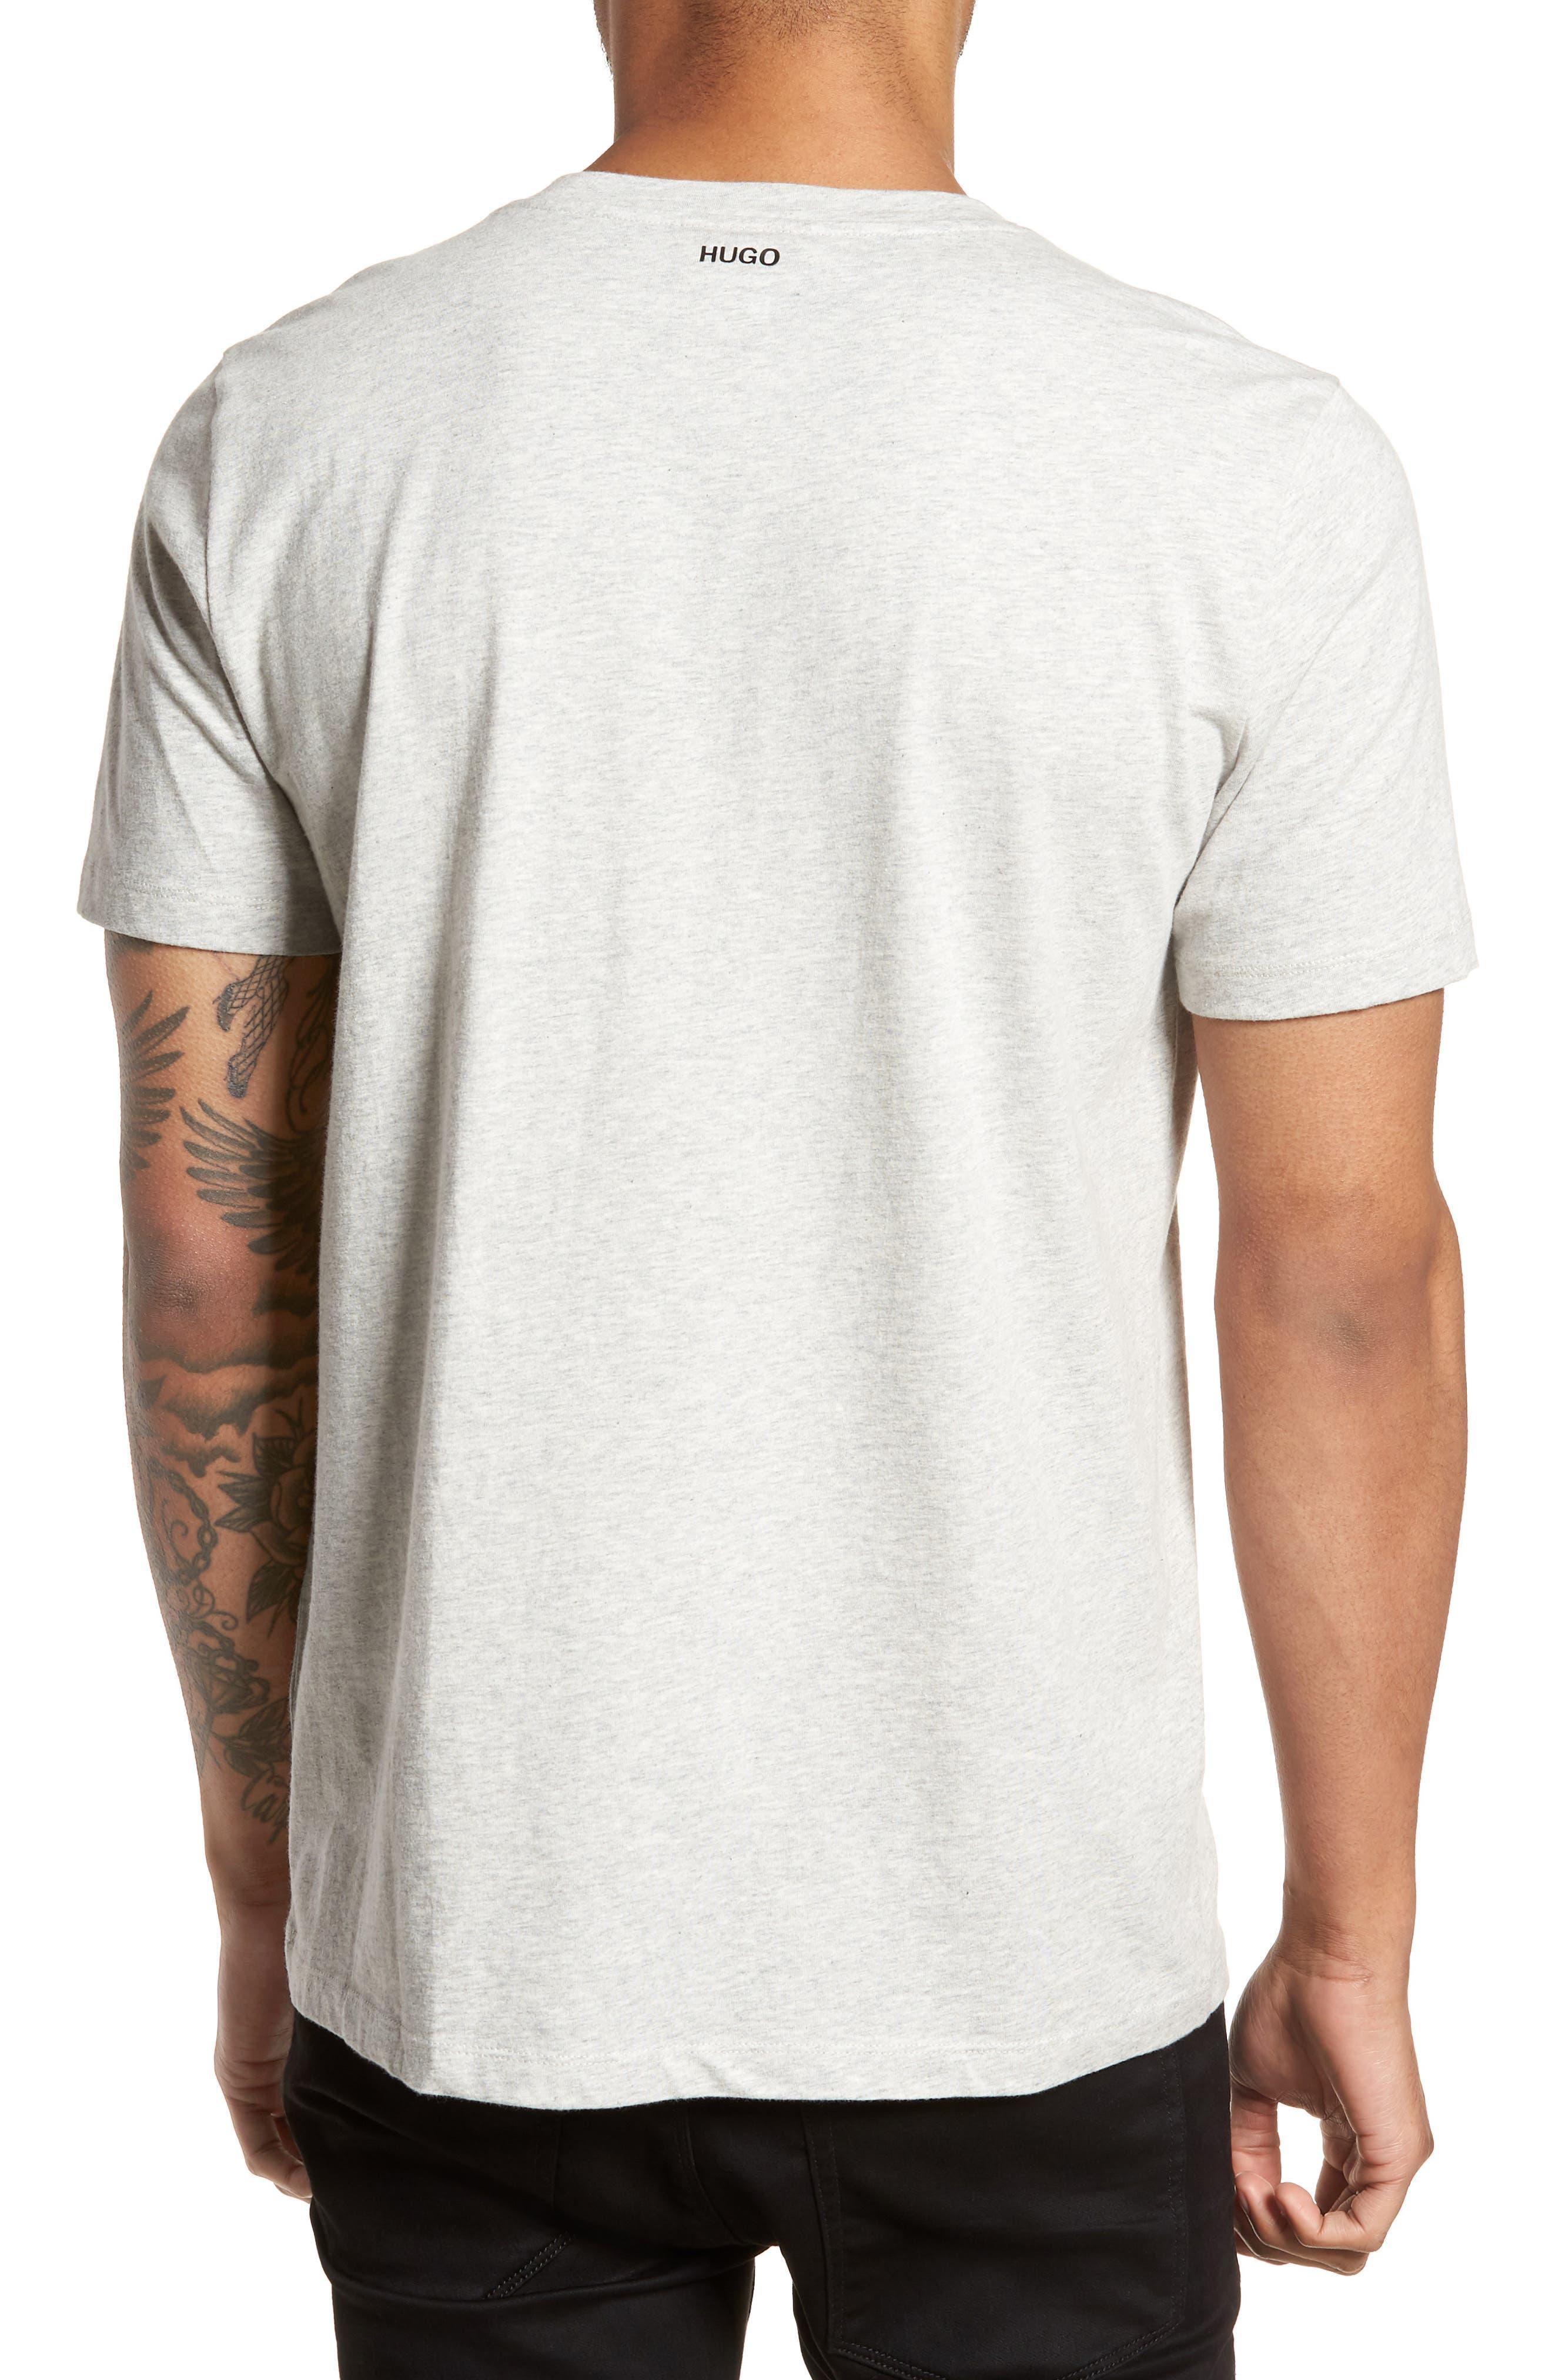 Drush Slim Fit Graphic T-Shirt,                             Alternate thumbnail 2, color,                             Grey